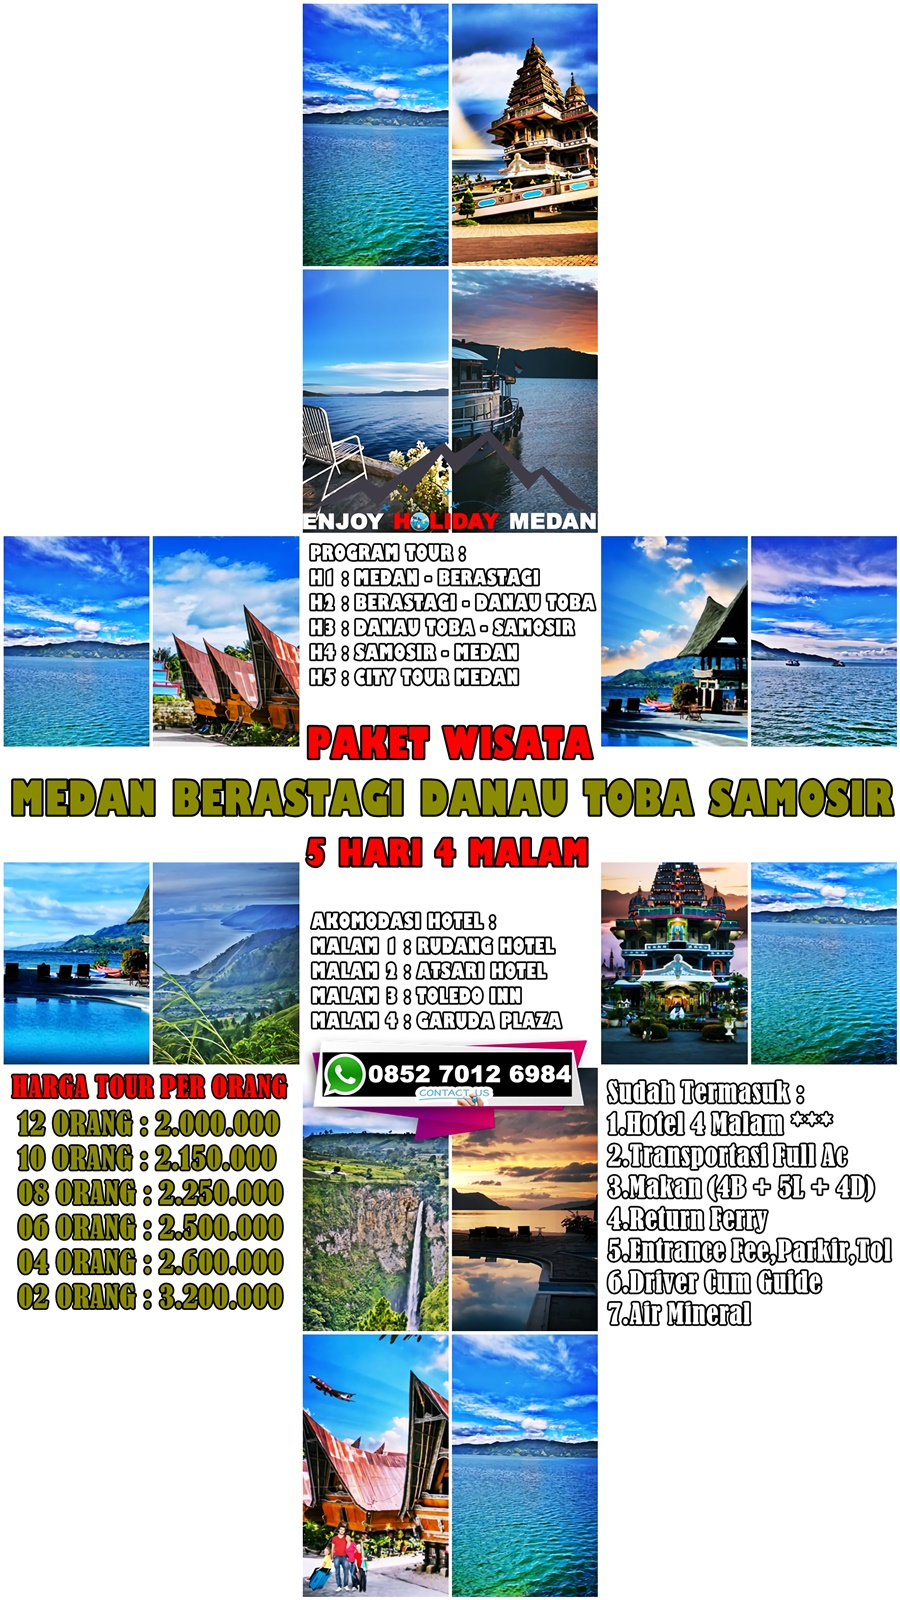 Enjoy Holiday Medan 5 Hari 4 Malam